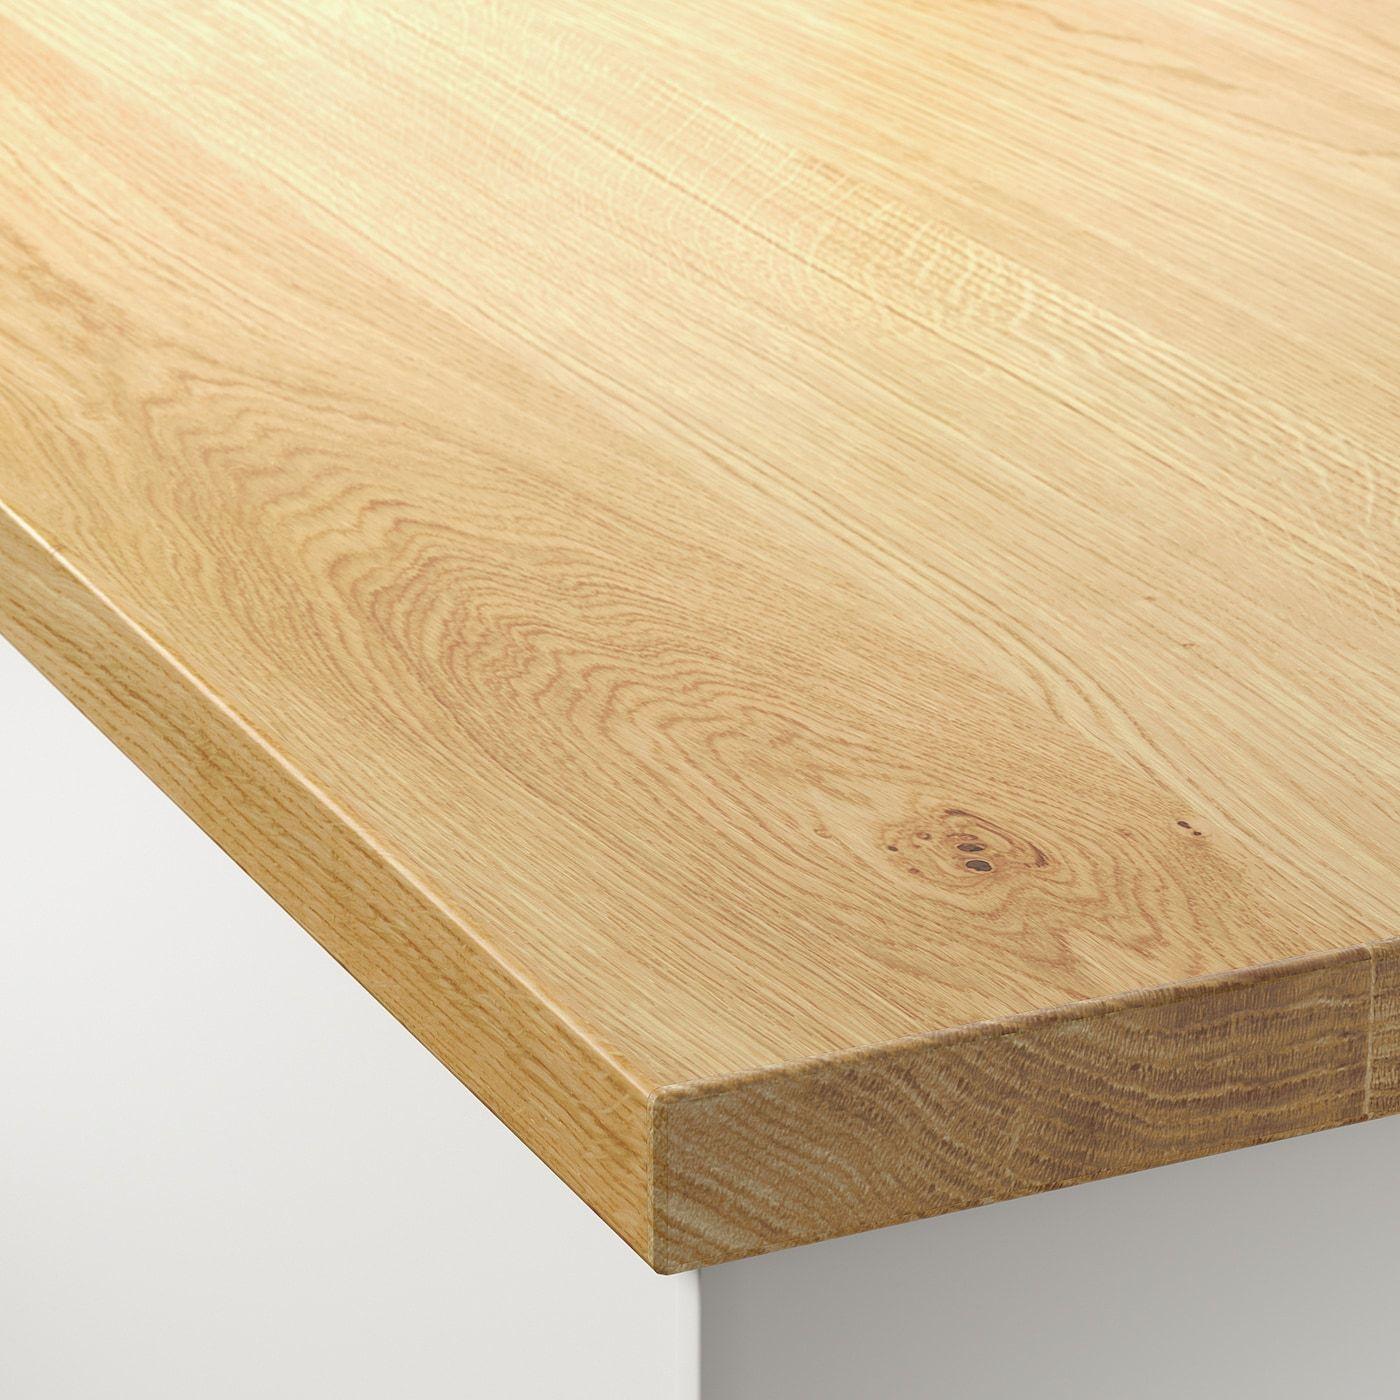 Mollekulla Arbeitsplatte Eiche Furnier Ikea Osterreich In 2020 Kitchen Countertops Countertops Wood Countertops